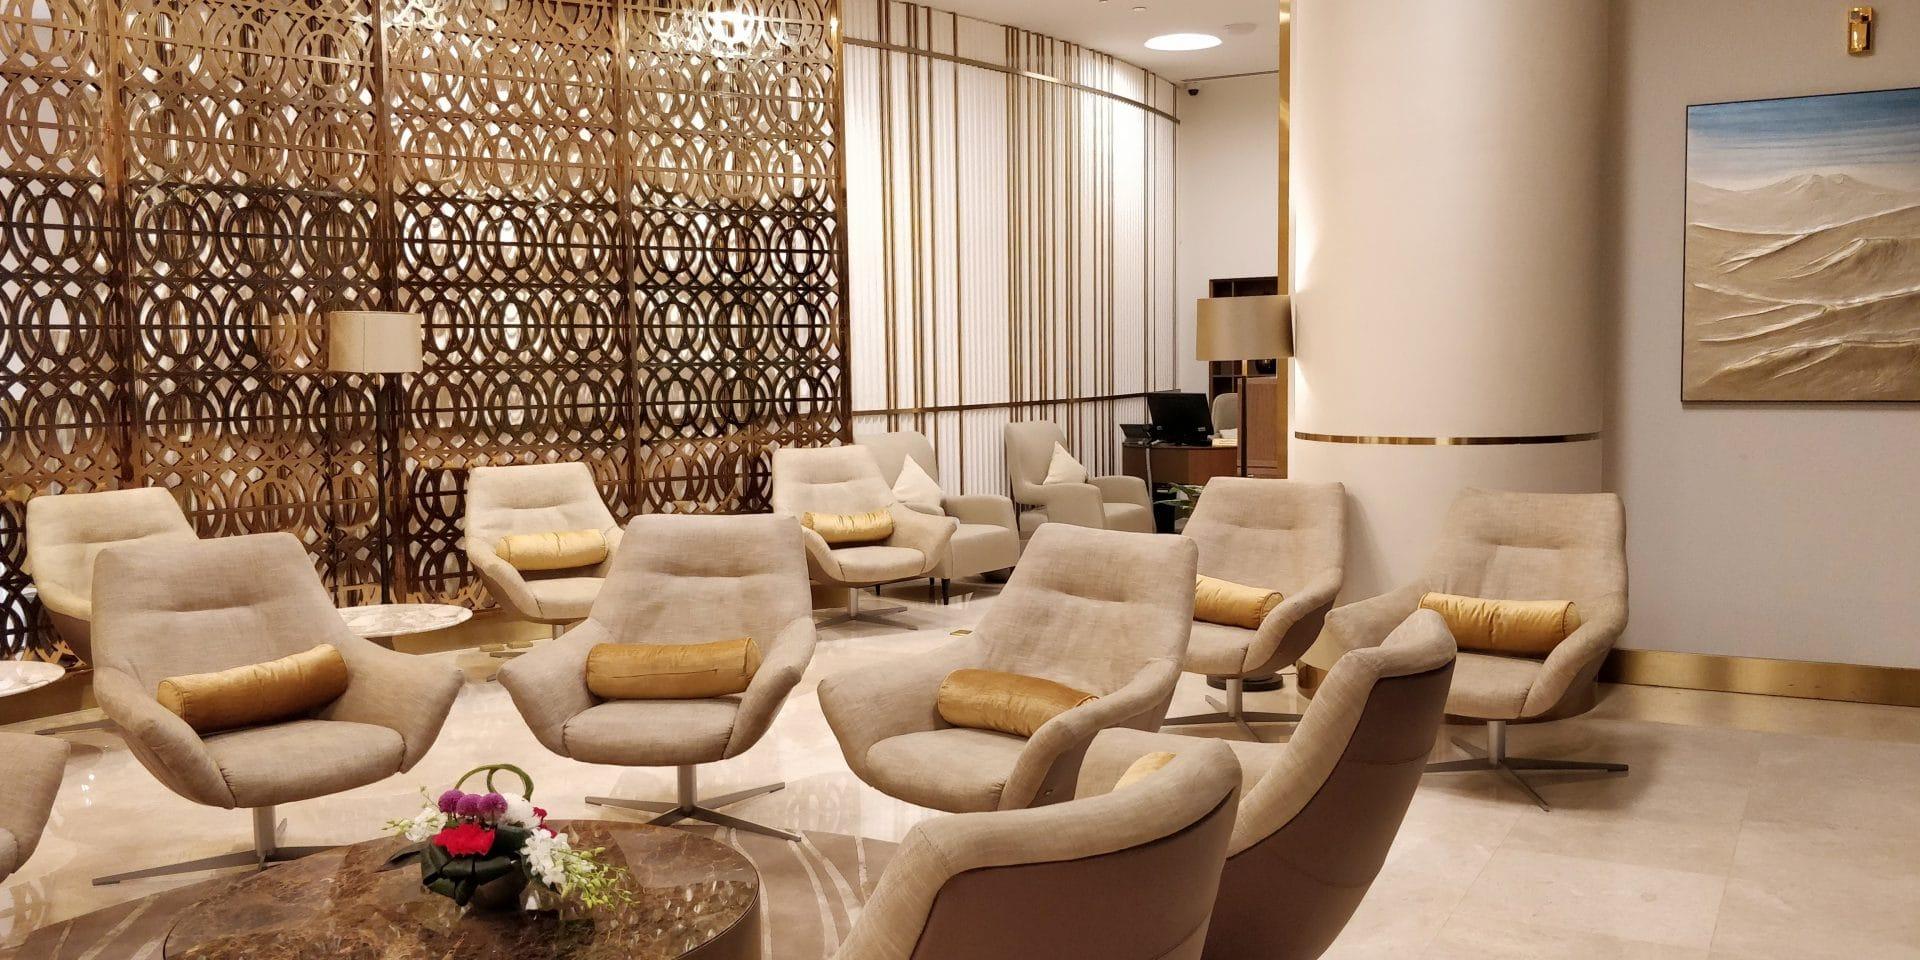 Oman Air Lounge Maskat 8